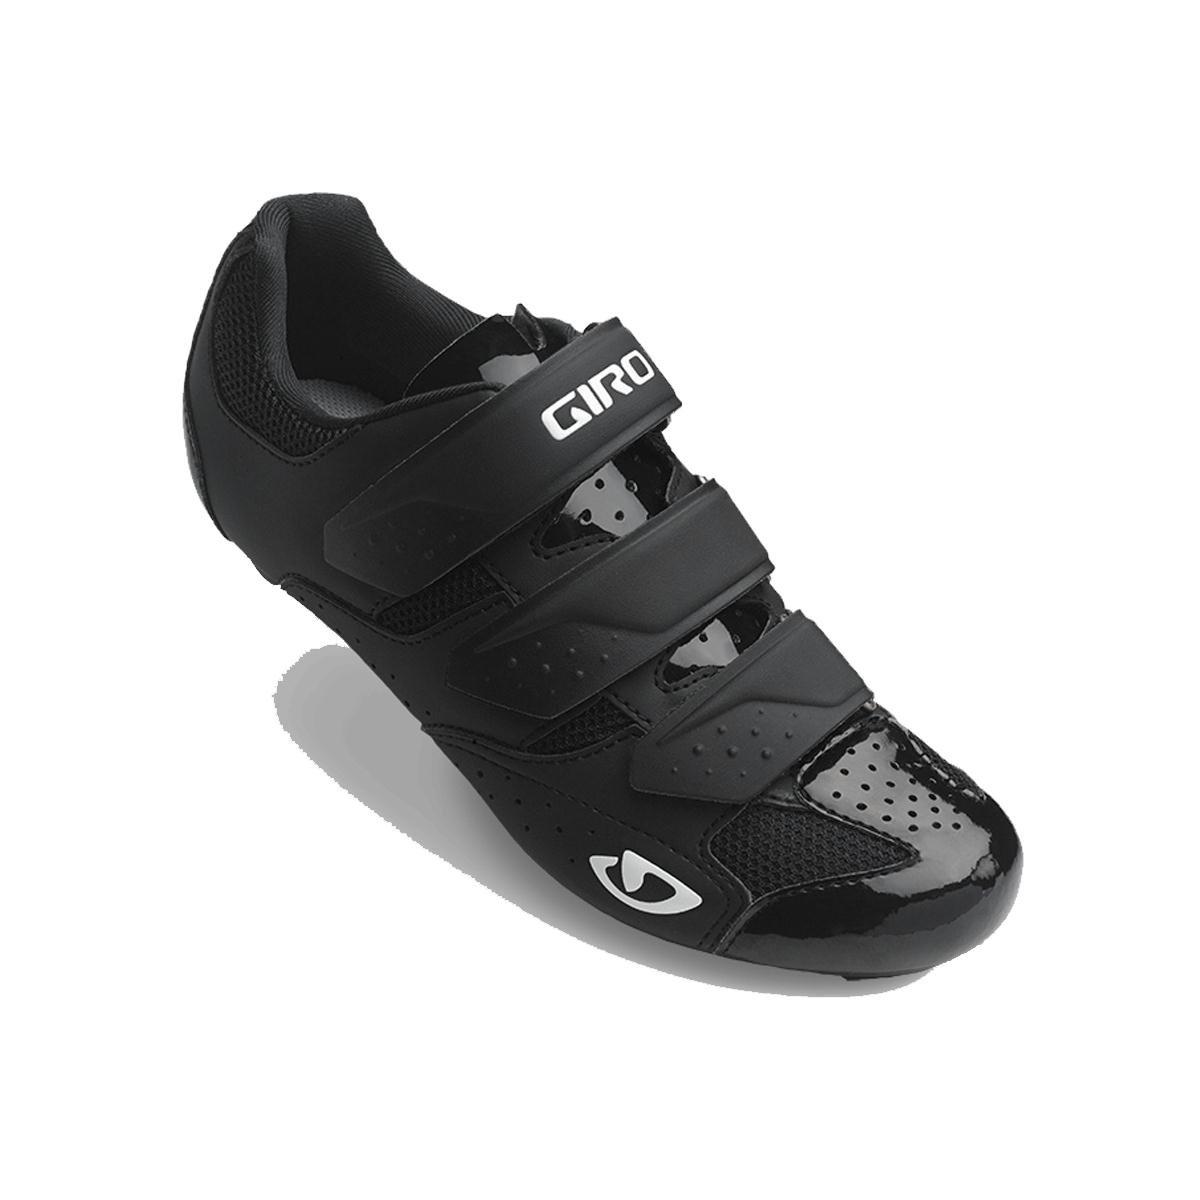 Giro GF22175 Women's Techne Shoe B01MRXT5EO 43|Black